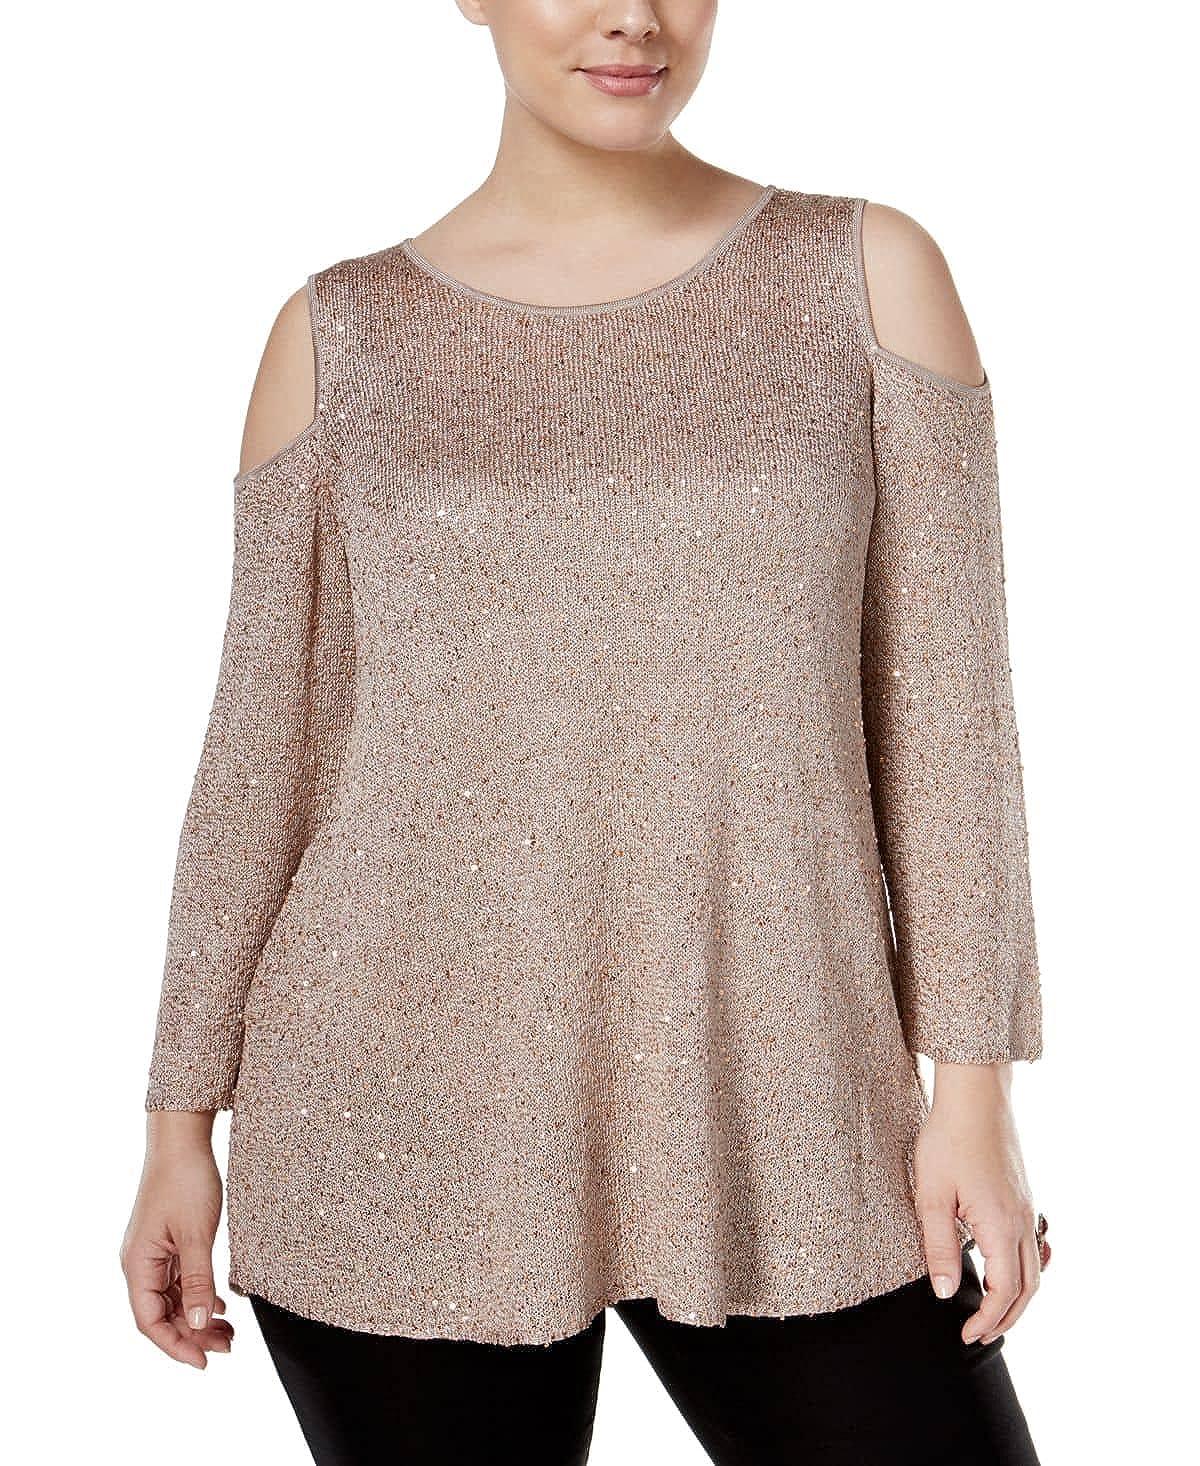 Alfani Womens Plus Metallic Sequined Pullover Top Beige 0X